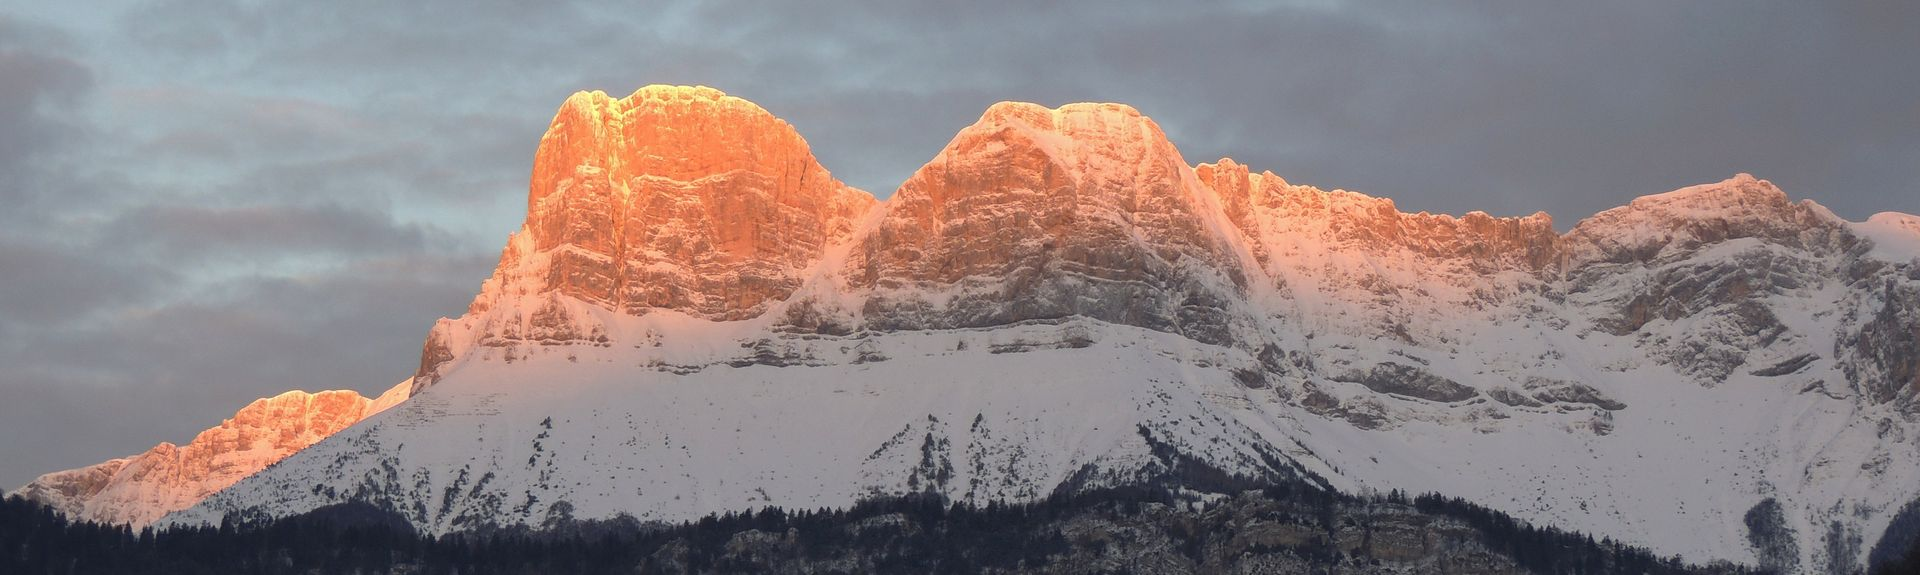 Rencurel, Auvérnia-Ródano-Alpes, França